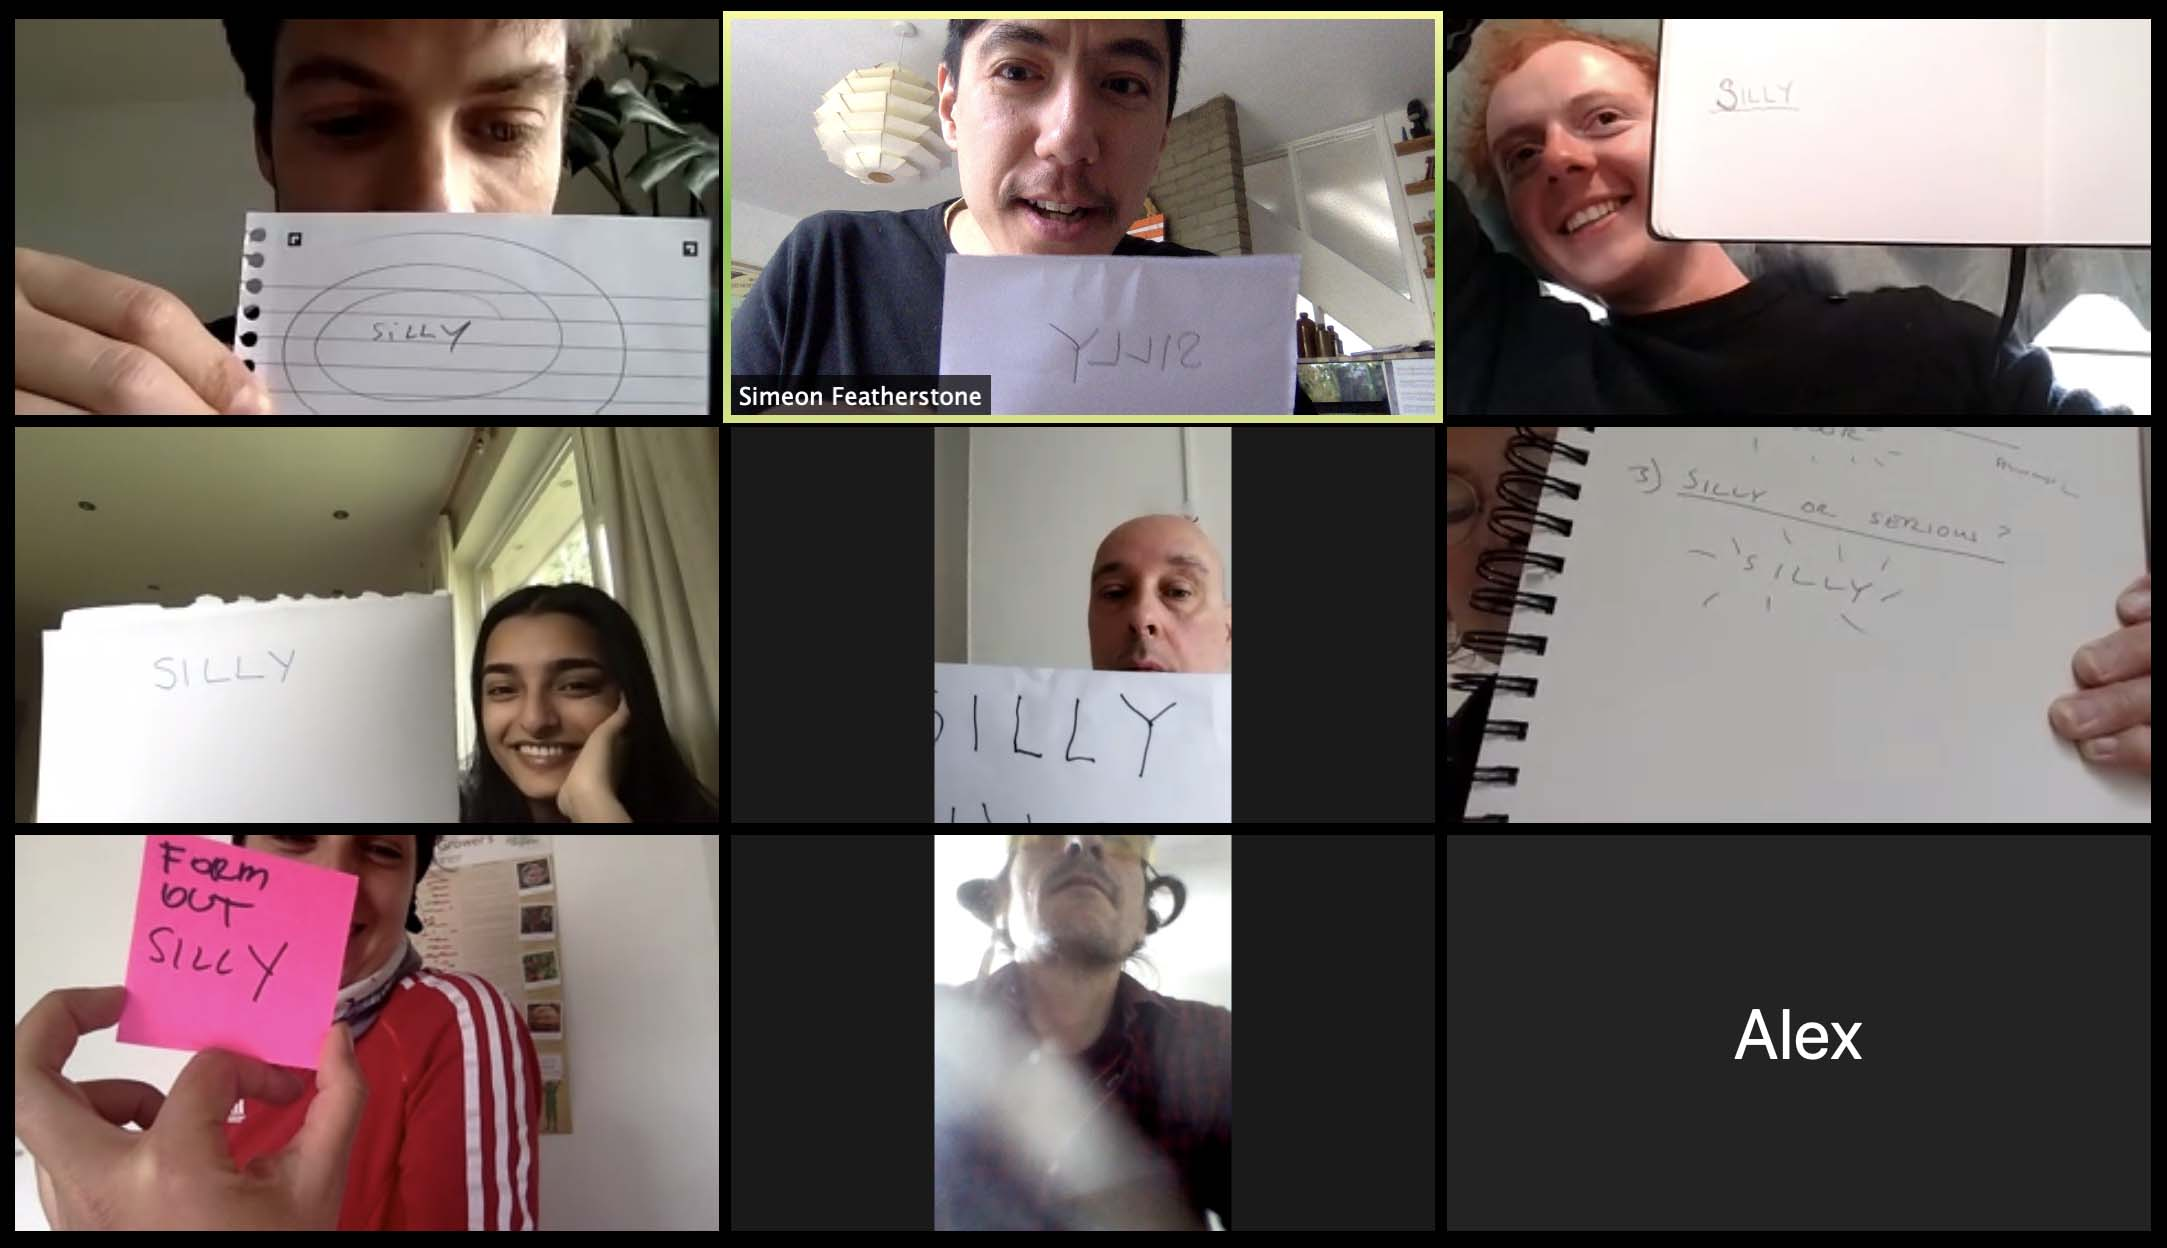 Screenshoot of nine people on Zoom platform holding up signs